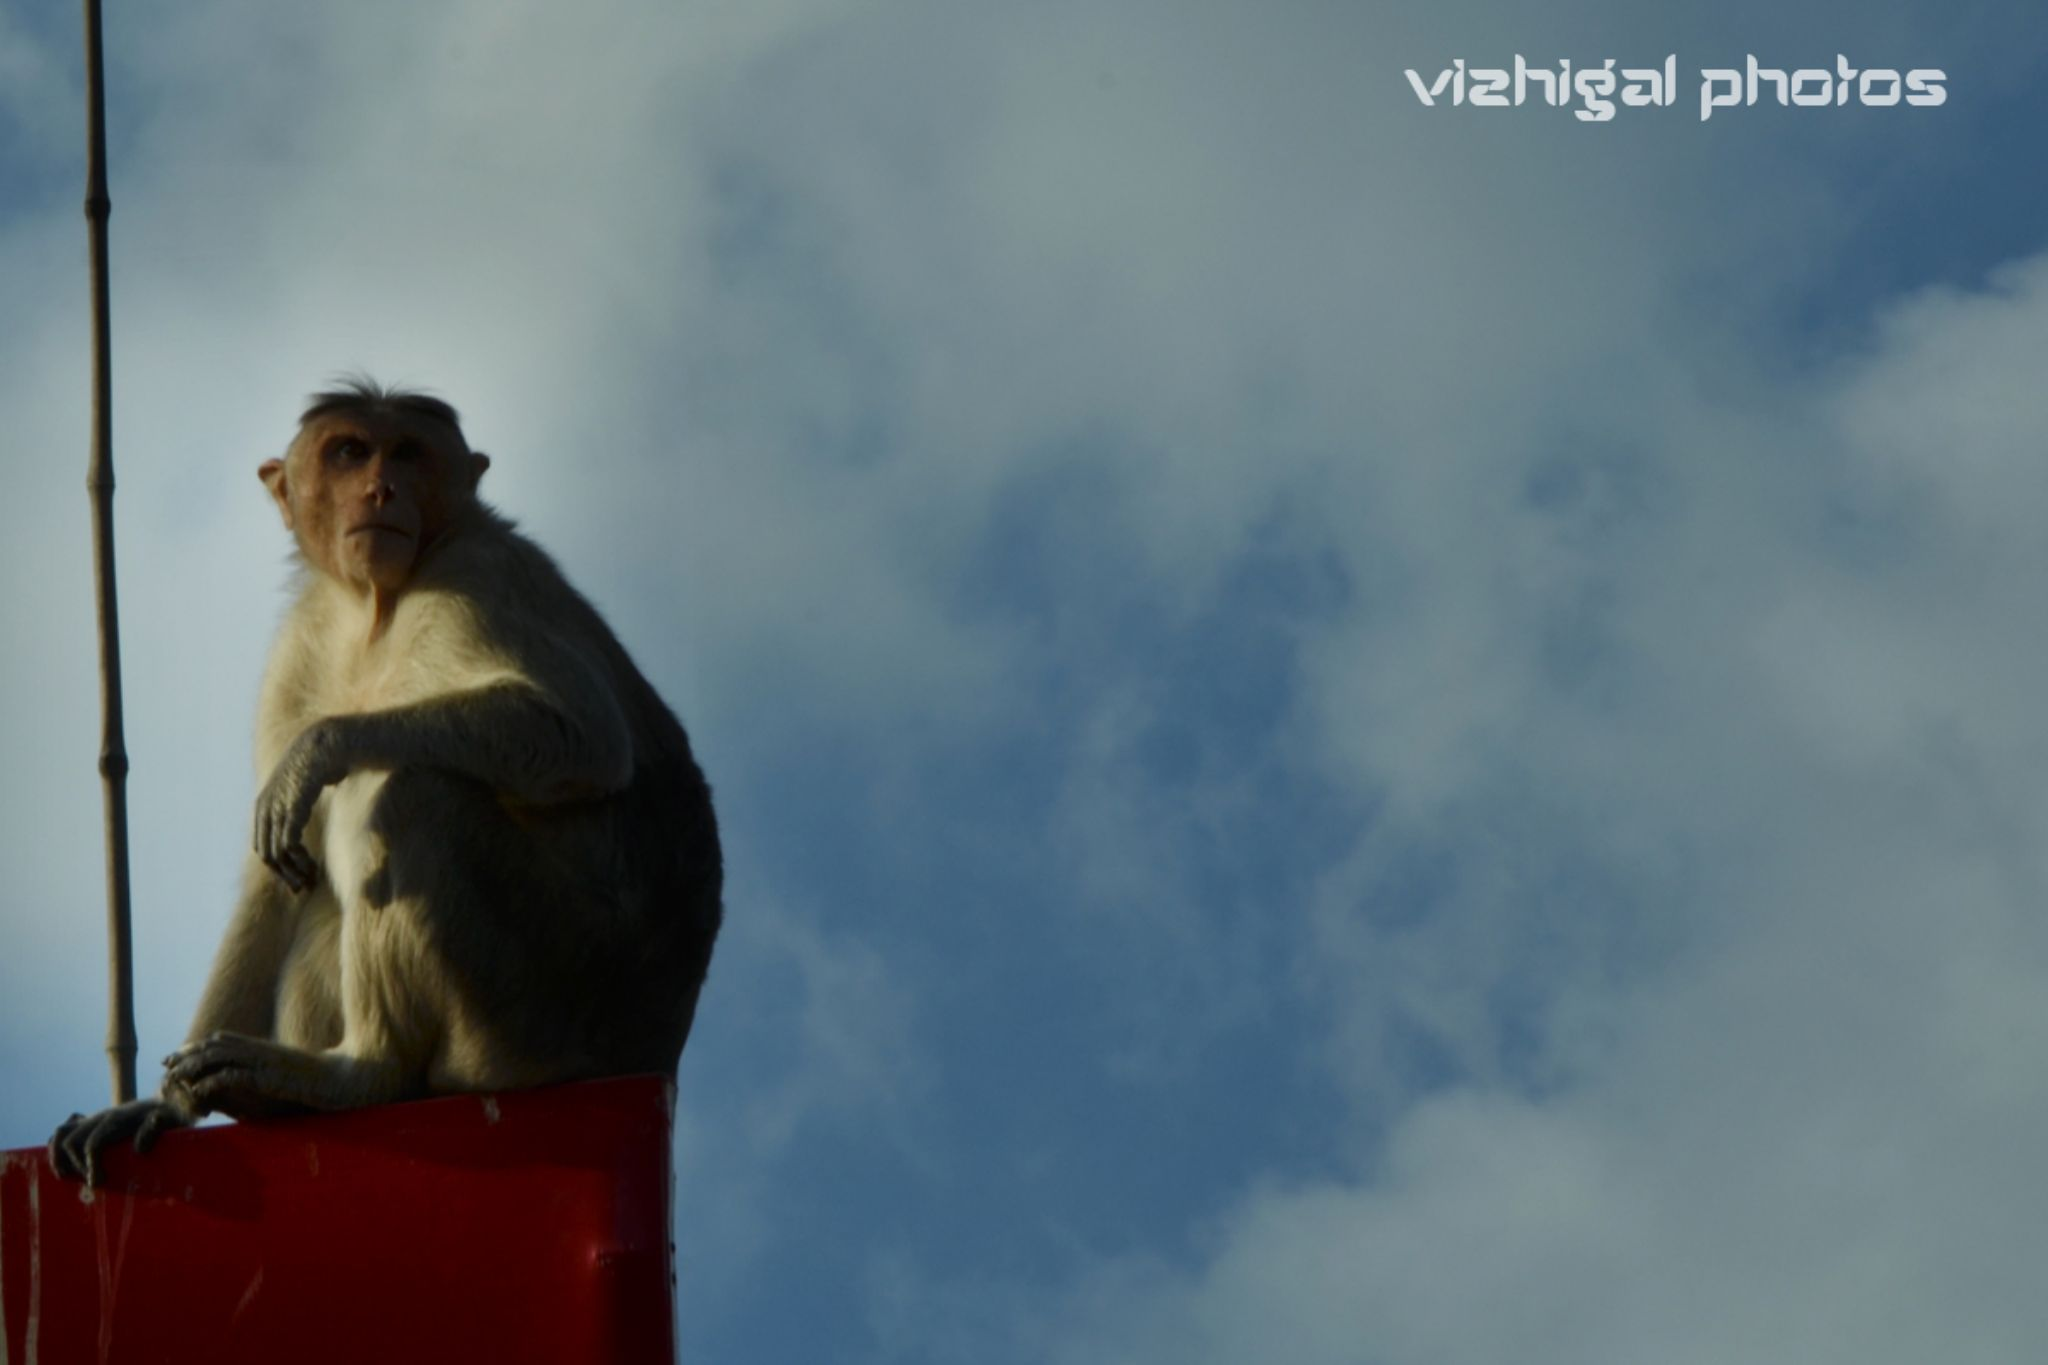 alone by Vizhigal Photos